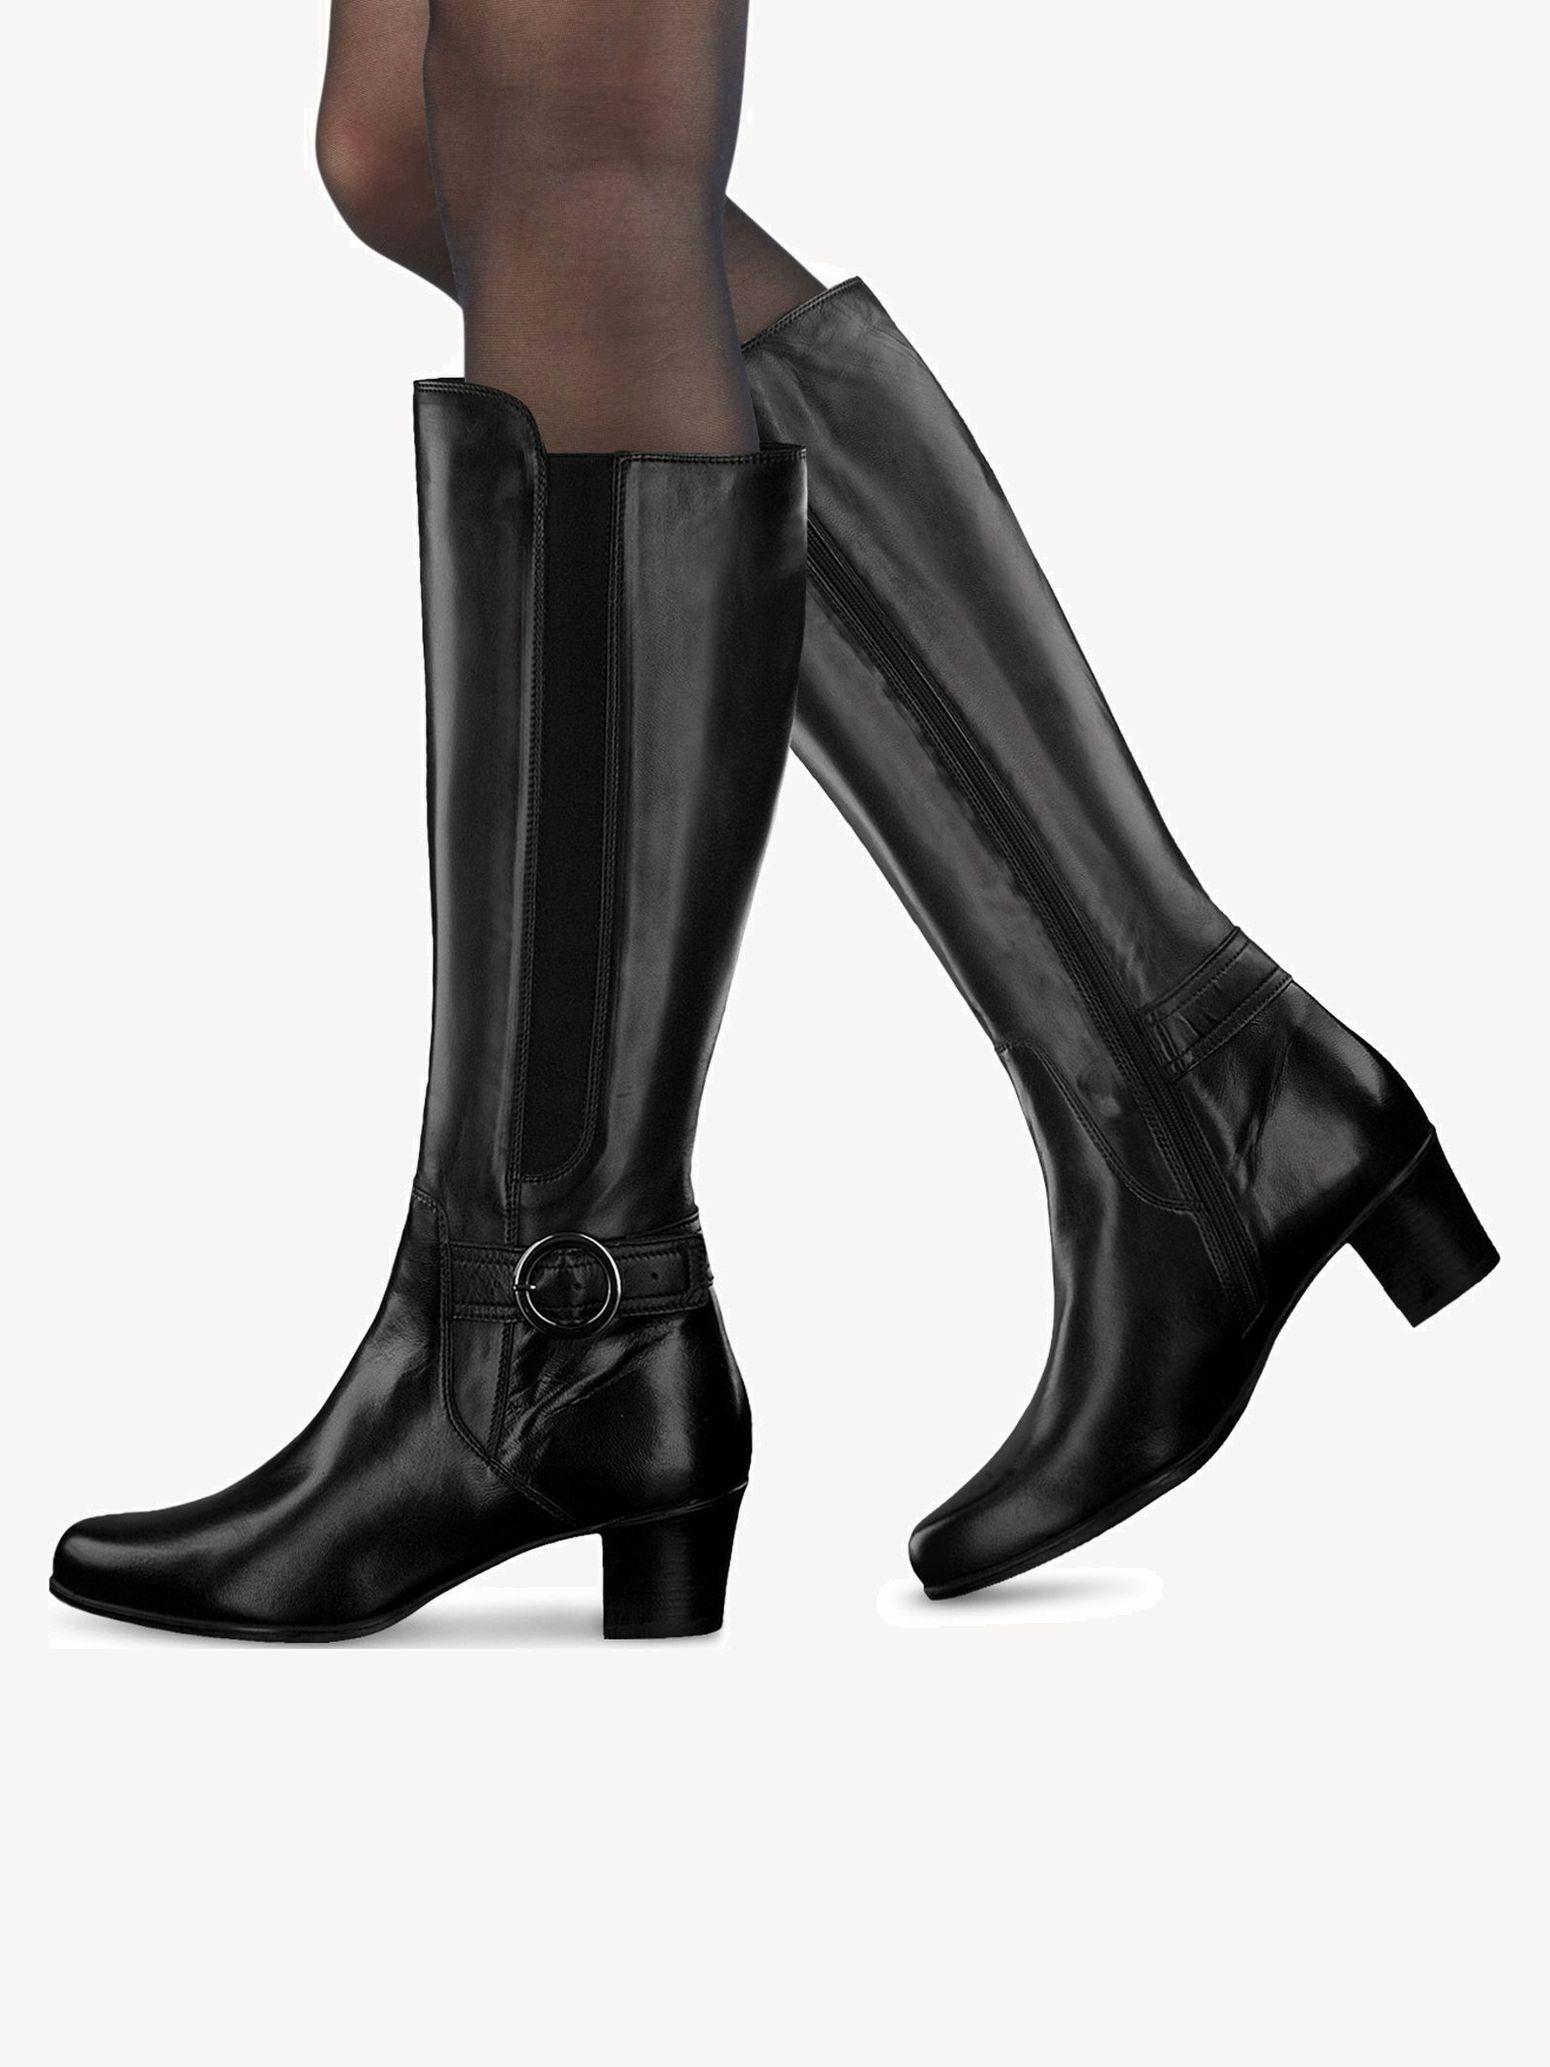 Tamaris Stiefel BLACK Art.:1 1 25549 21001 | Tamaris Schuhe